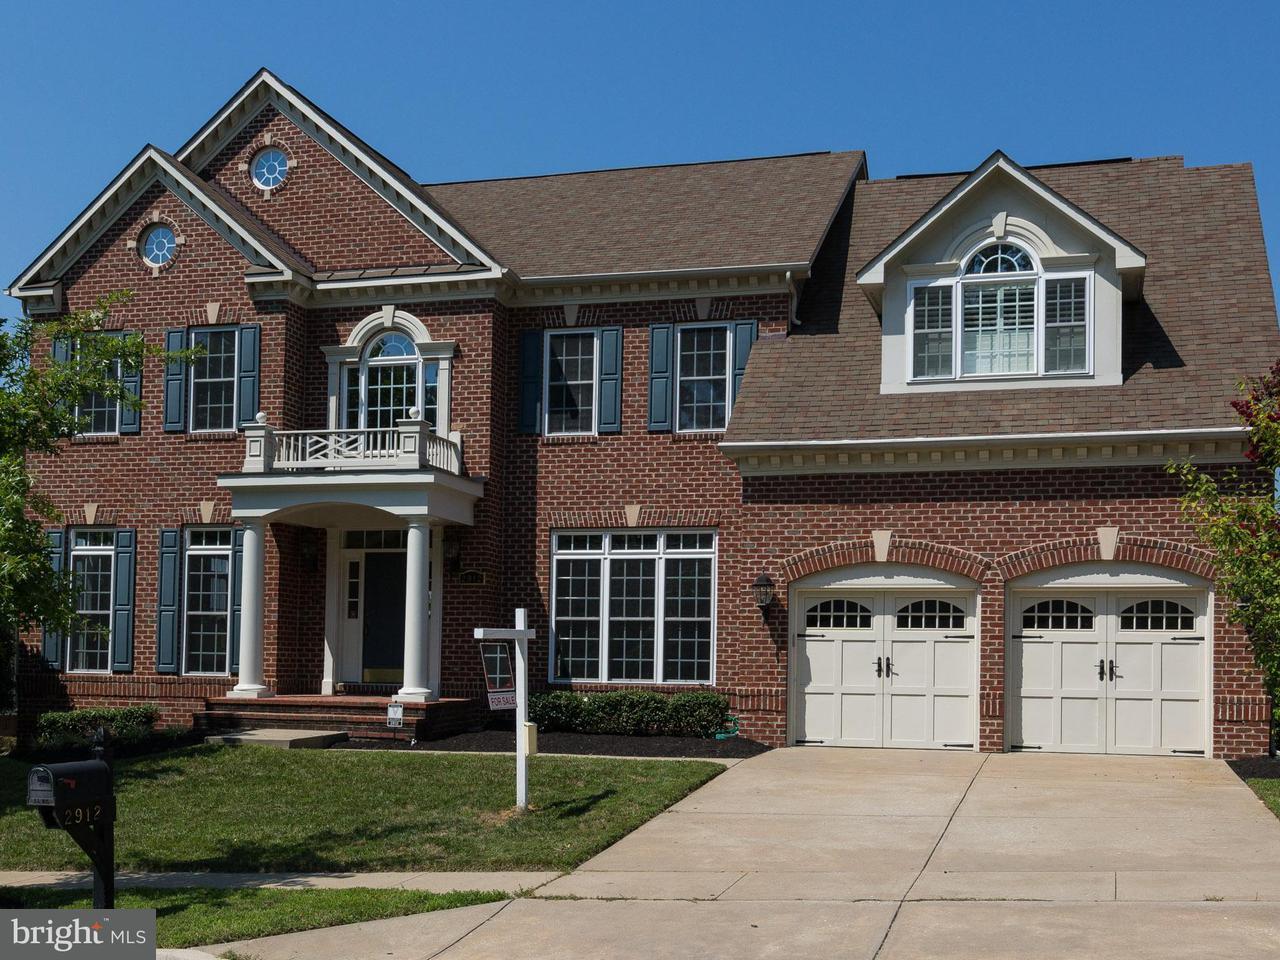 Single Family Home for Sale at 2912 Galeshead Drive 2912 Galeshead Drive Upper Marlboro, Maryland 20774 United States